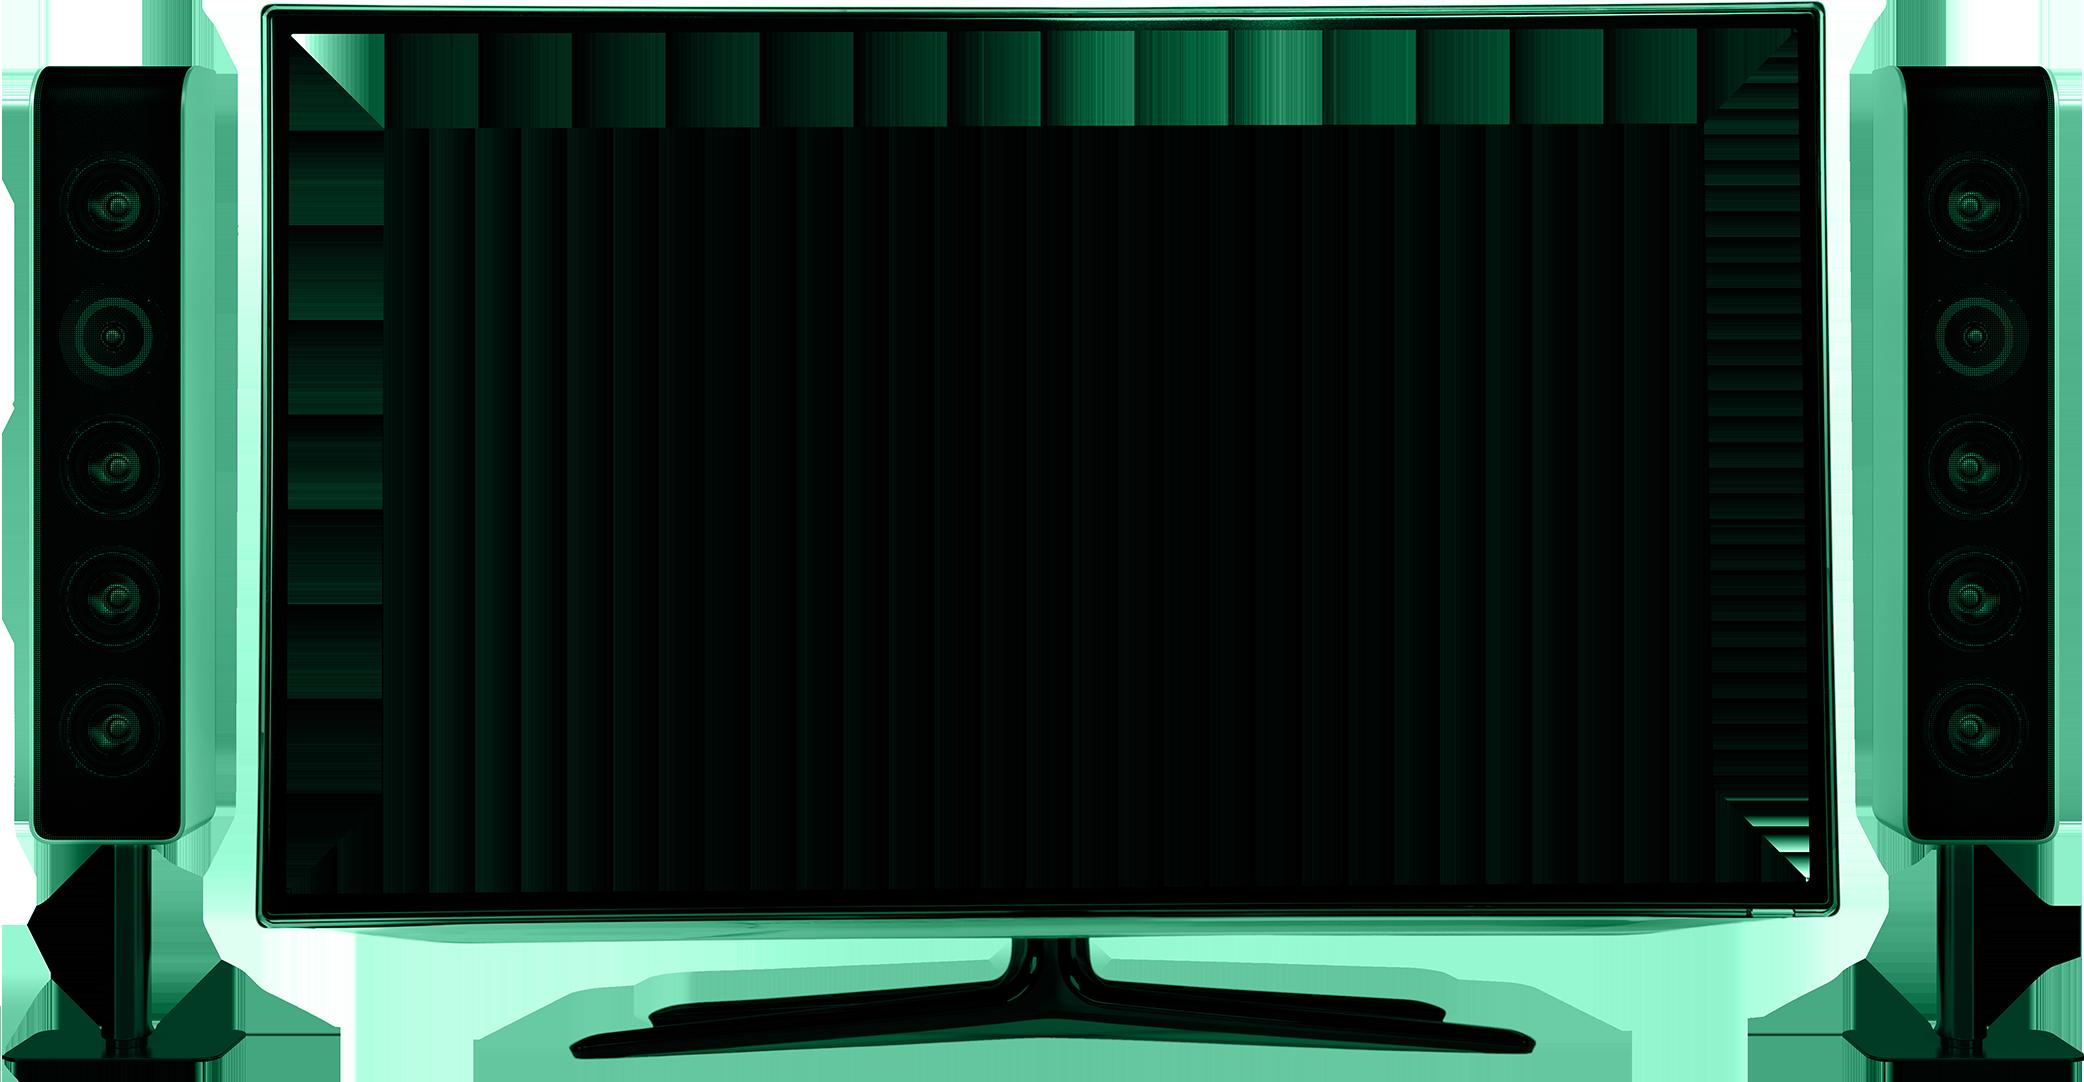 tv image